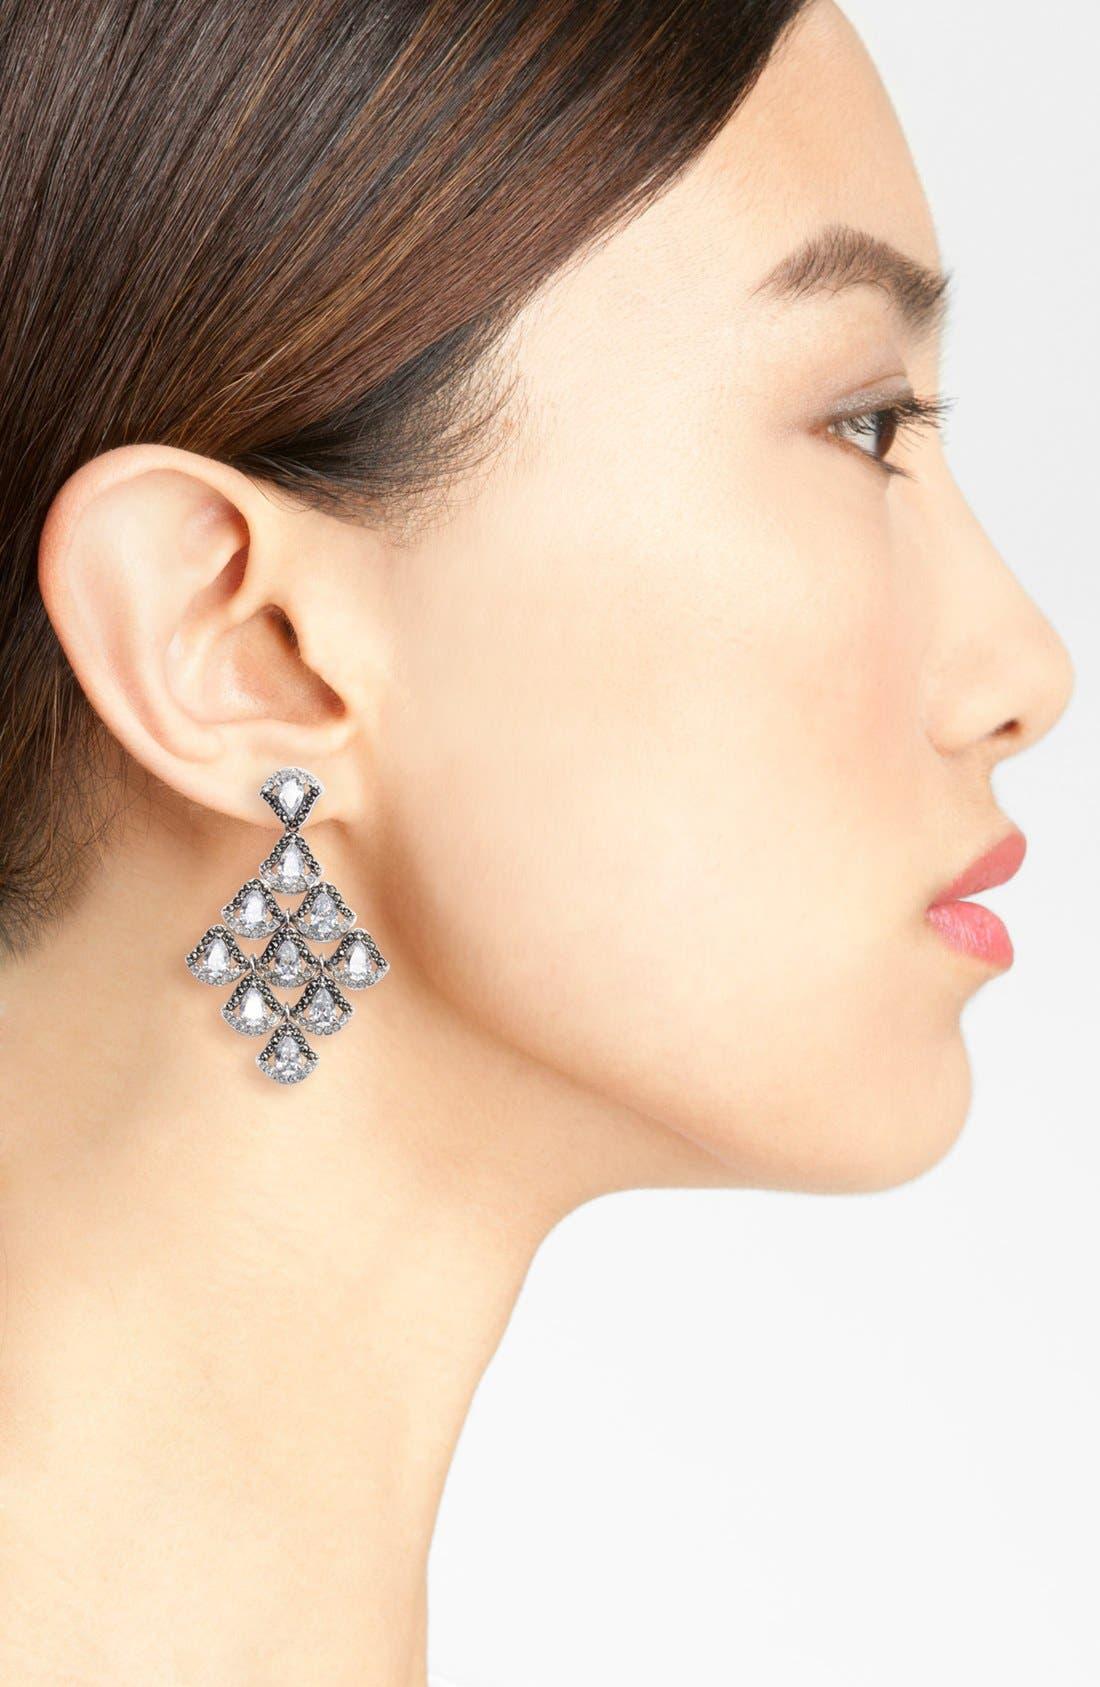 Semiprecious Stone Chandelier Earrings,                             Alternate thumbnail 2, color,                             SILVER